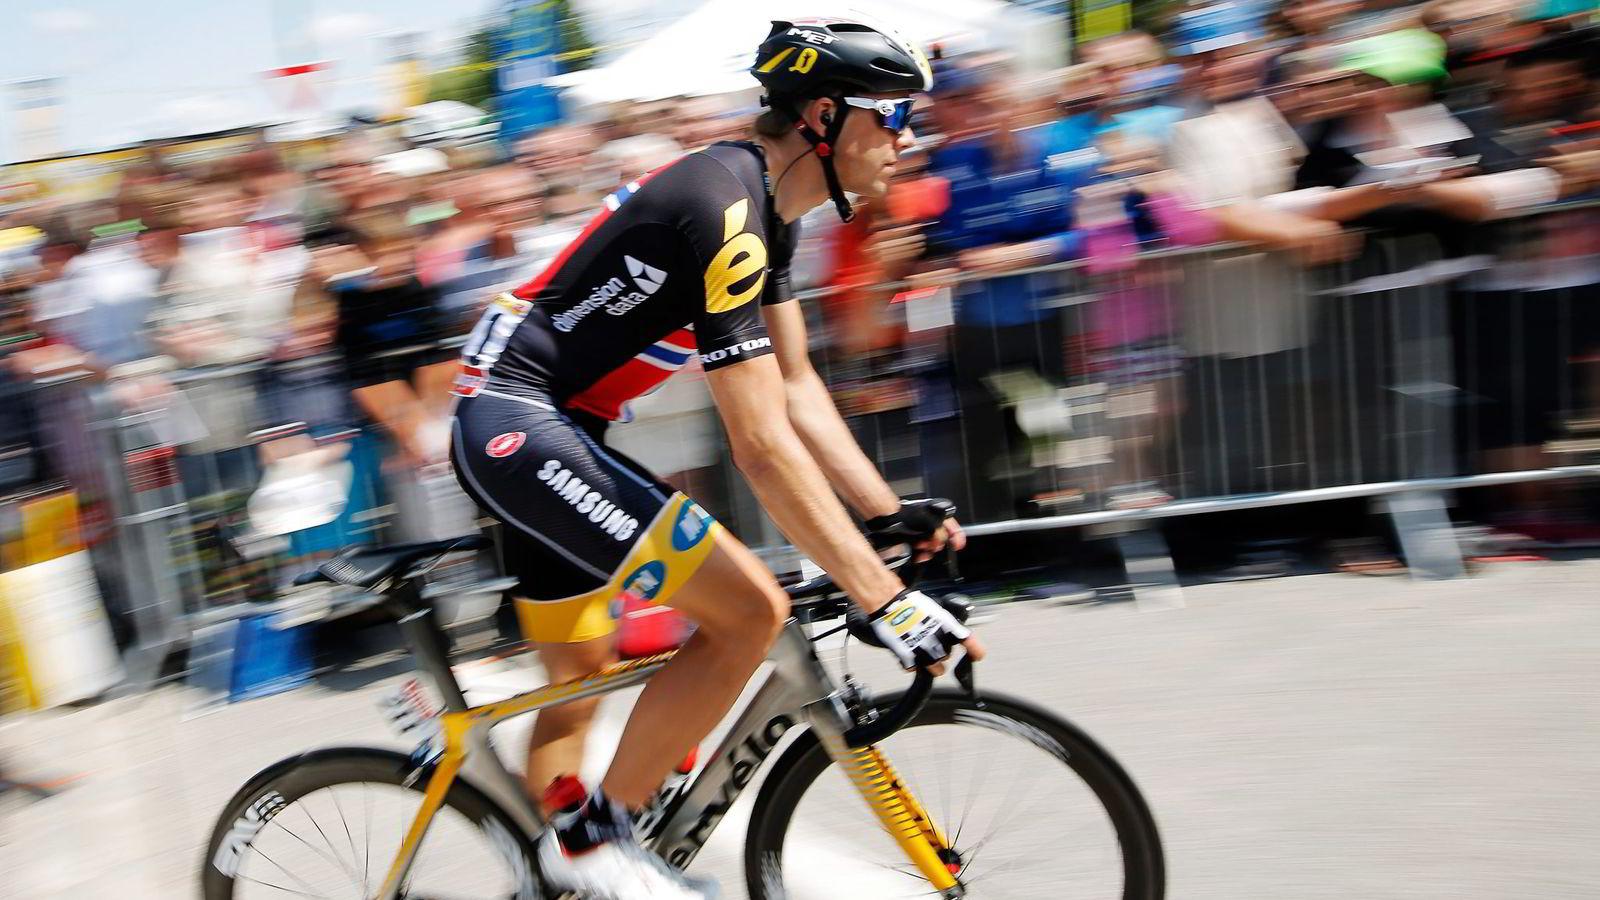 Edvald Boasson Hagen i mål som nummer fem i Cambrai etter 4. etappe i Tour de France tirsdag. Foto: Laurent Cipriani, AP/NTB Scanpix